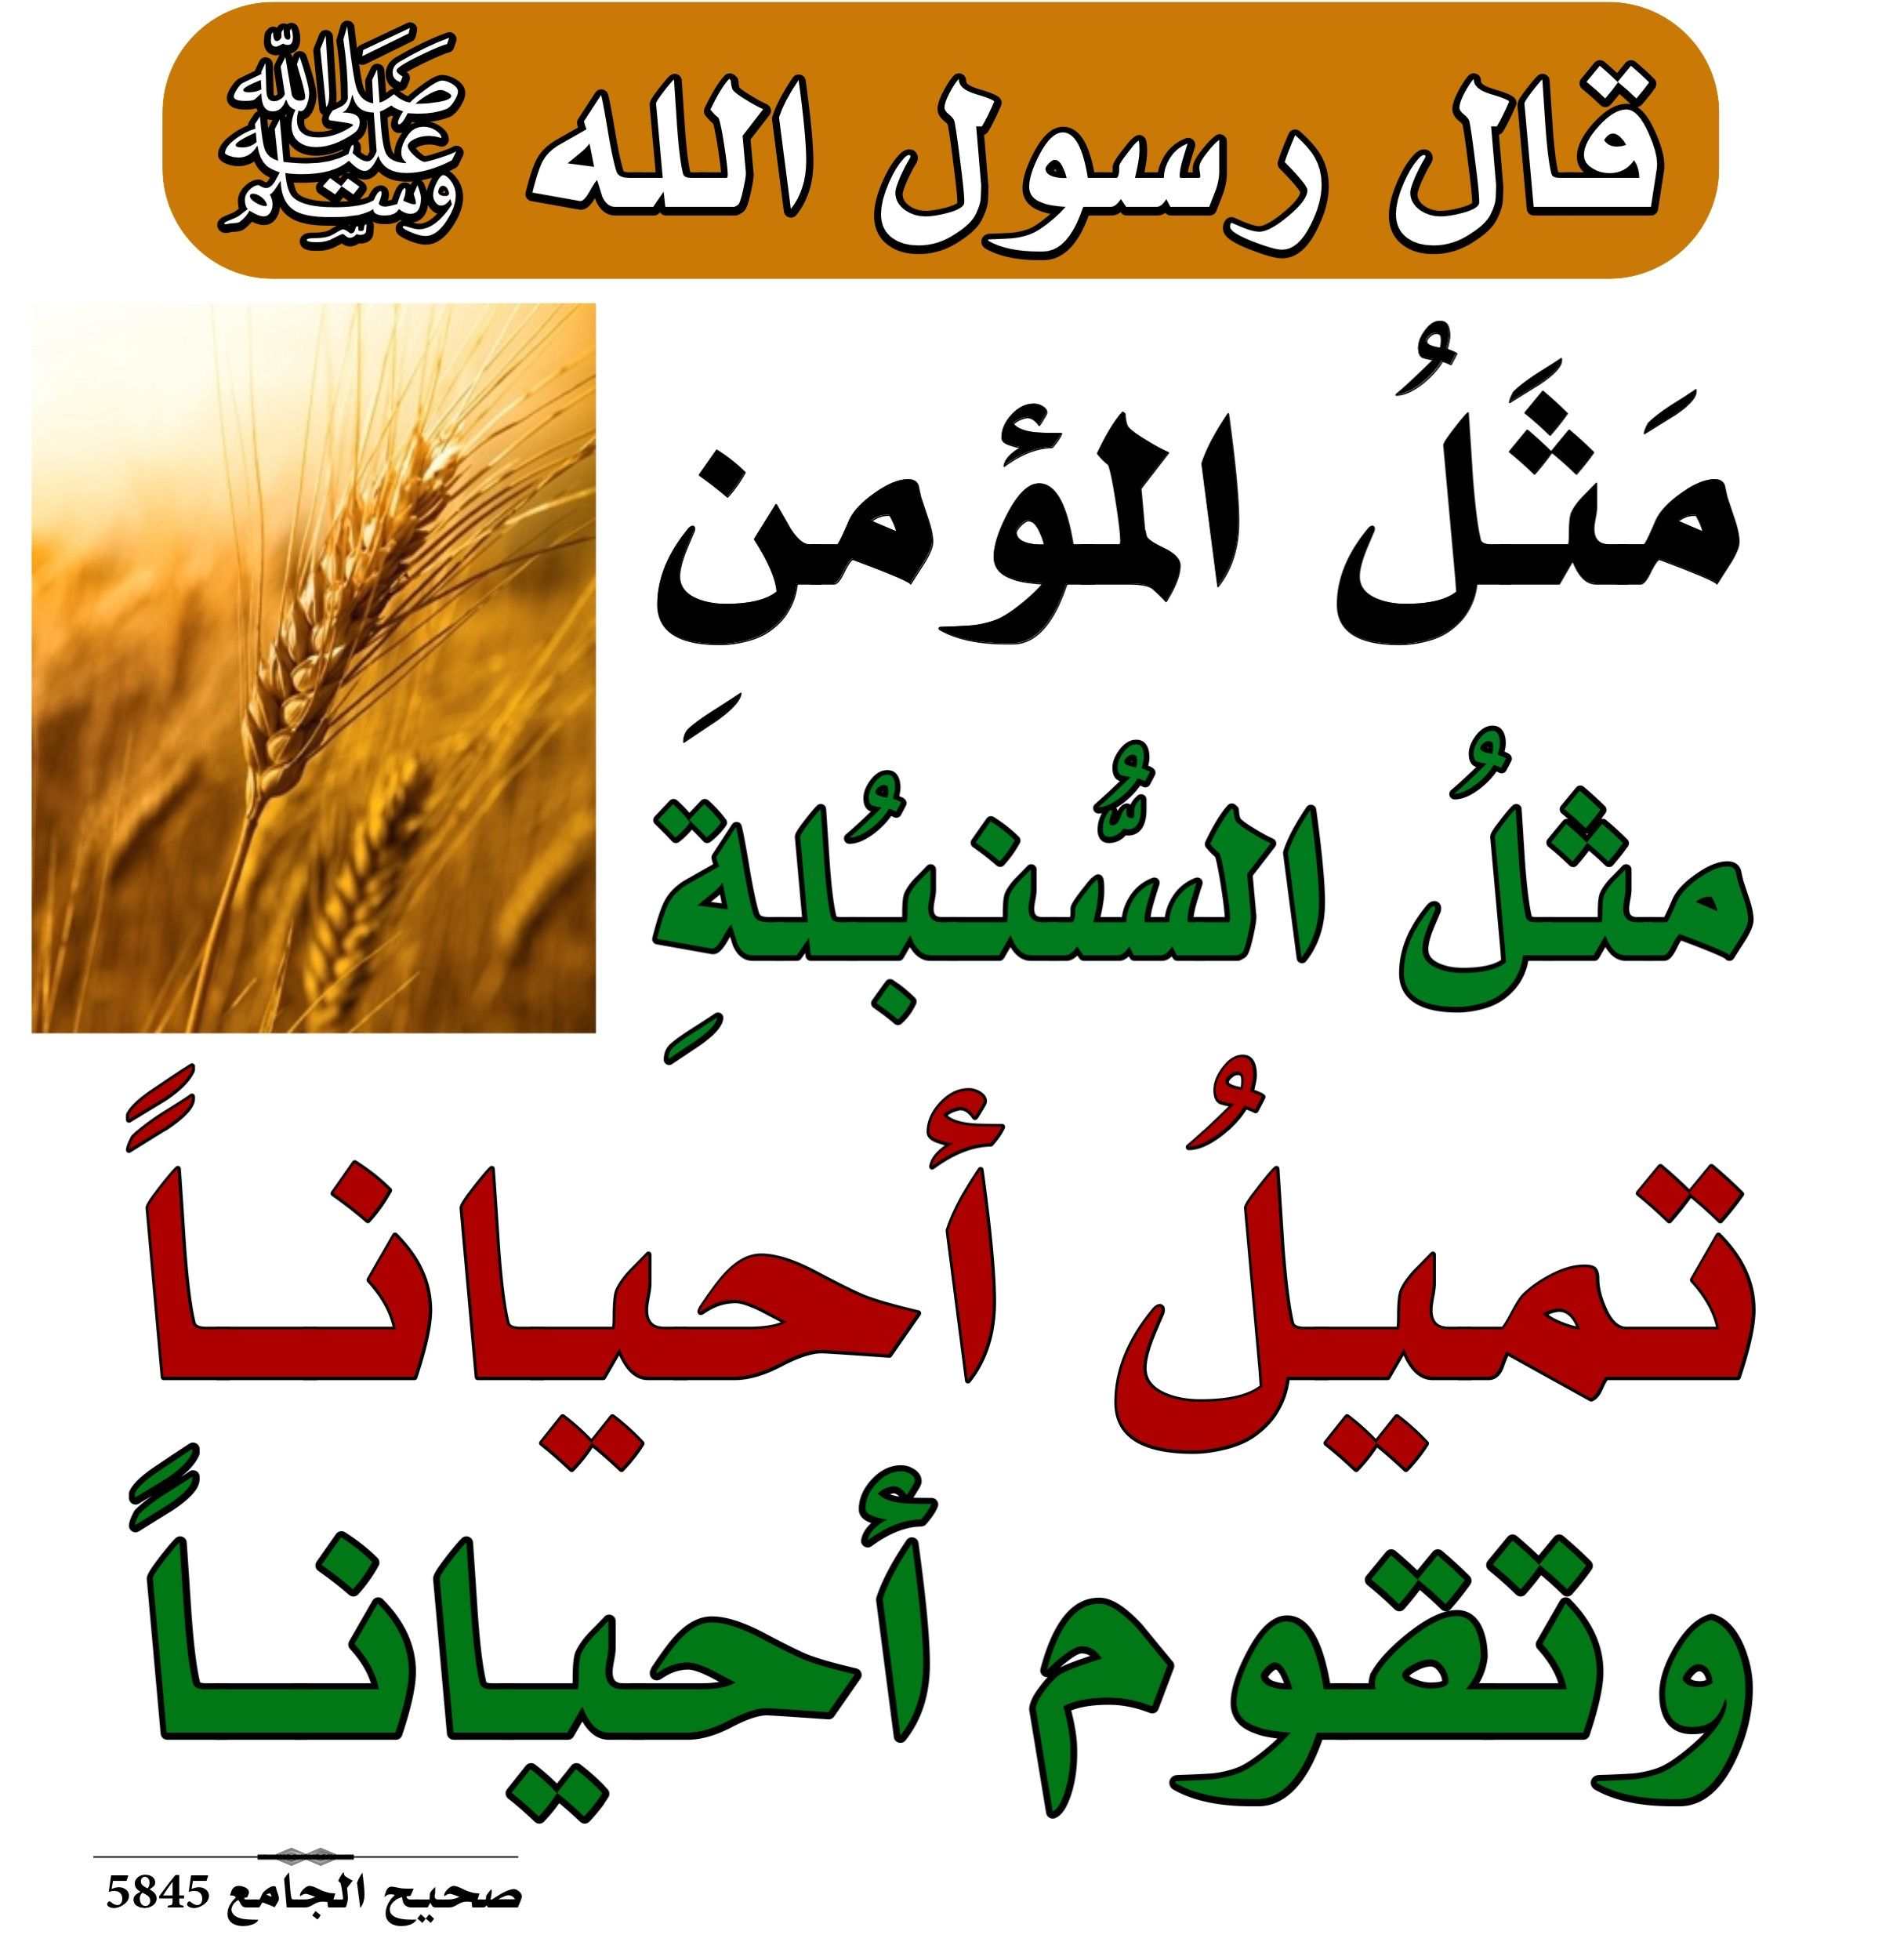 Pin By الأثر الجميل On أحاديث نبوية Islamic Quotes Islamic Phrases Islamic Quotes Wallpaper